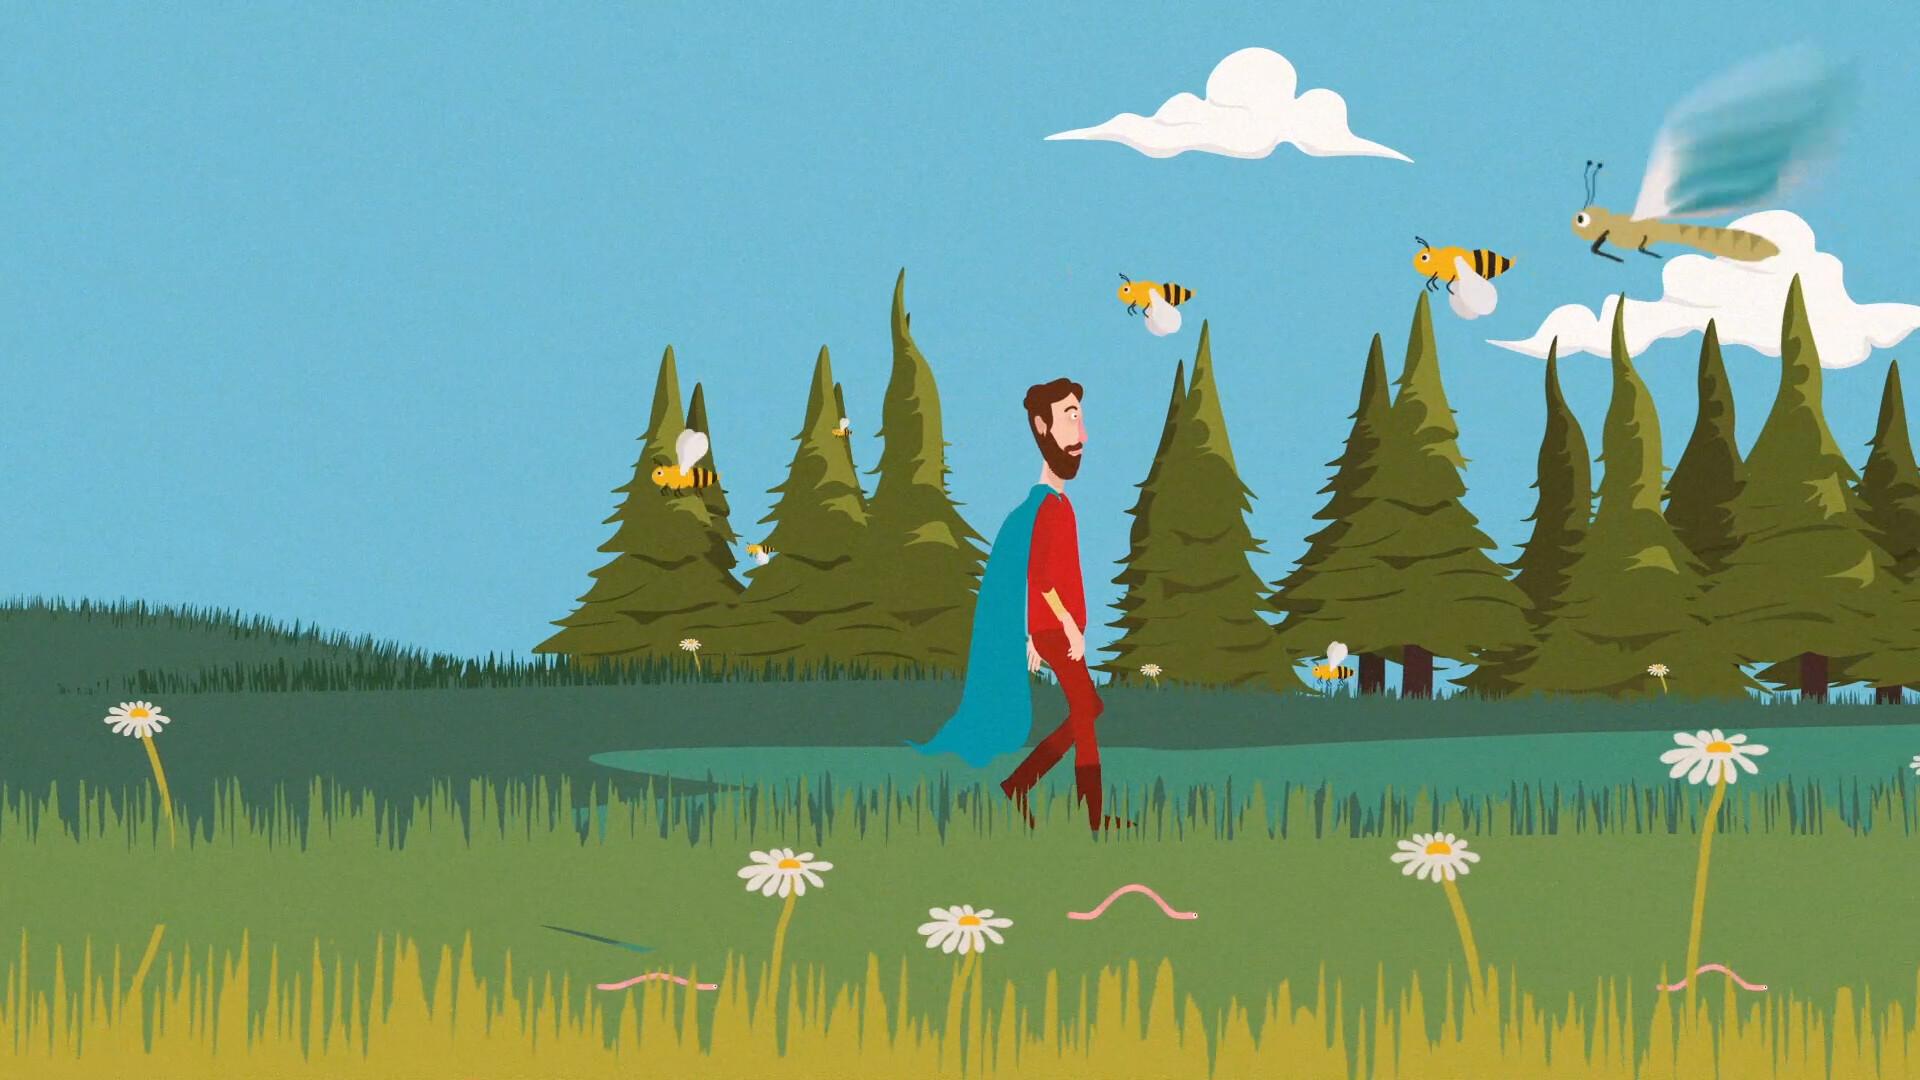 Matthieu vdk ifoam agriculture superheroes eng 01 no subtitles 4